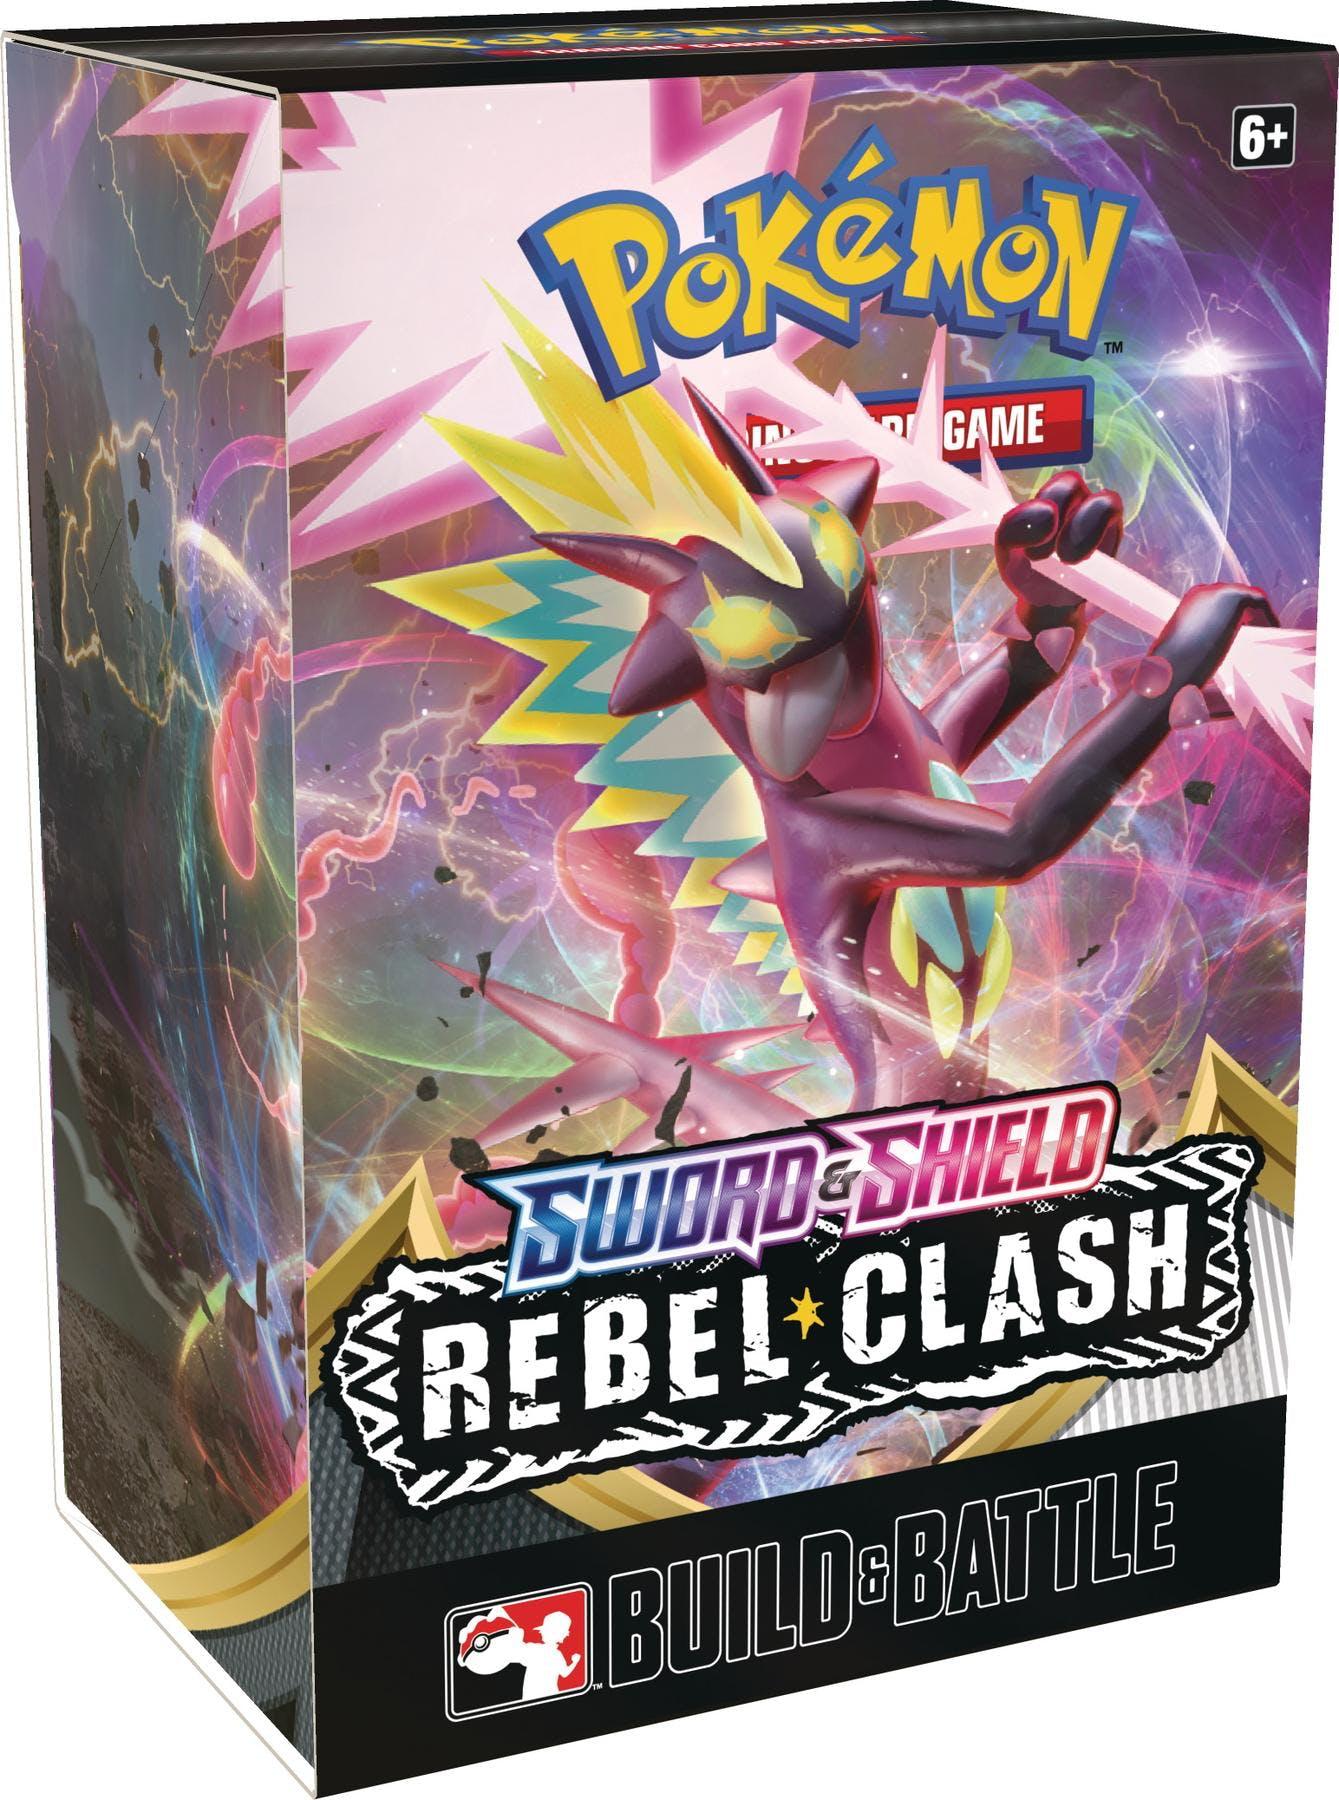 Sword & Shield - Rebel Clash Build and Battle Box